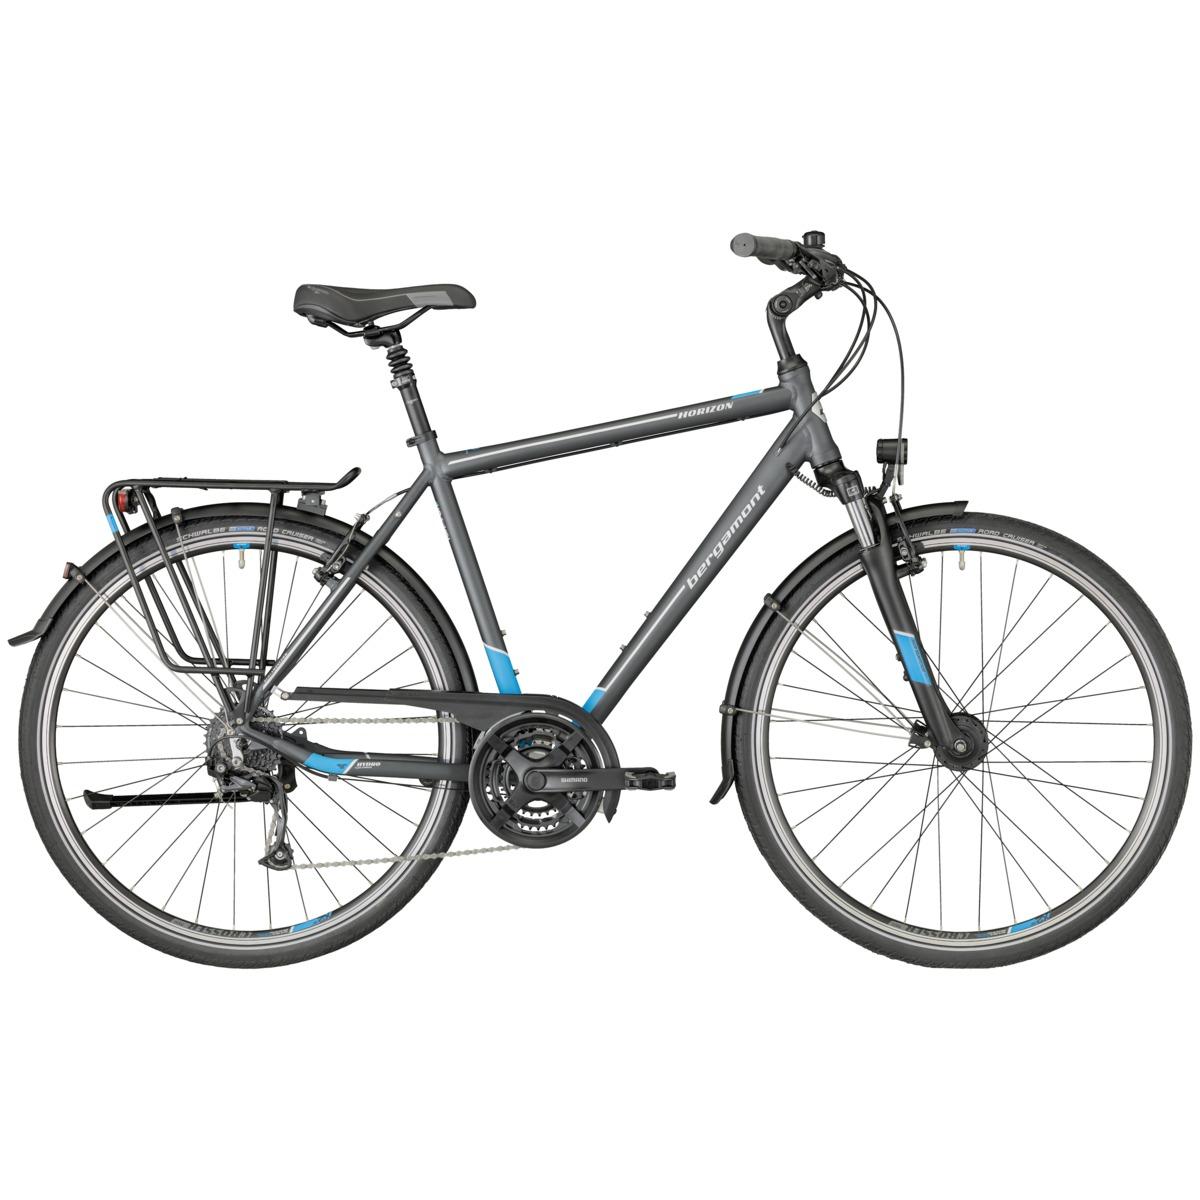 bergamont horizon 3 0 herren trekking fahrrad grau blau. Black Bedroom Furniture Sets. Home Design Ideas